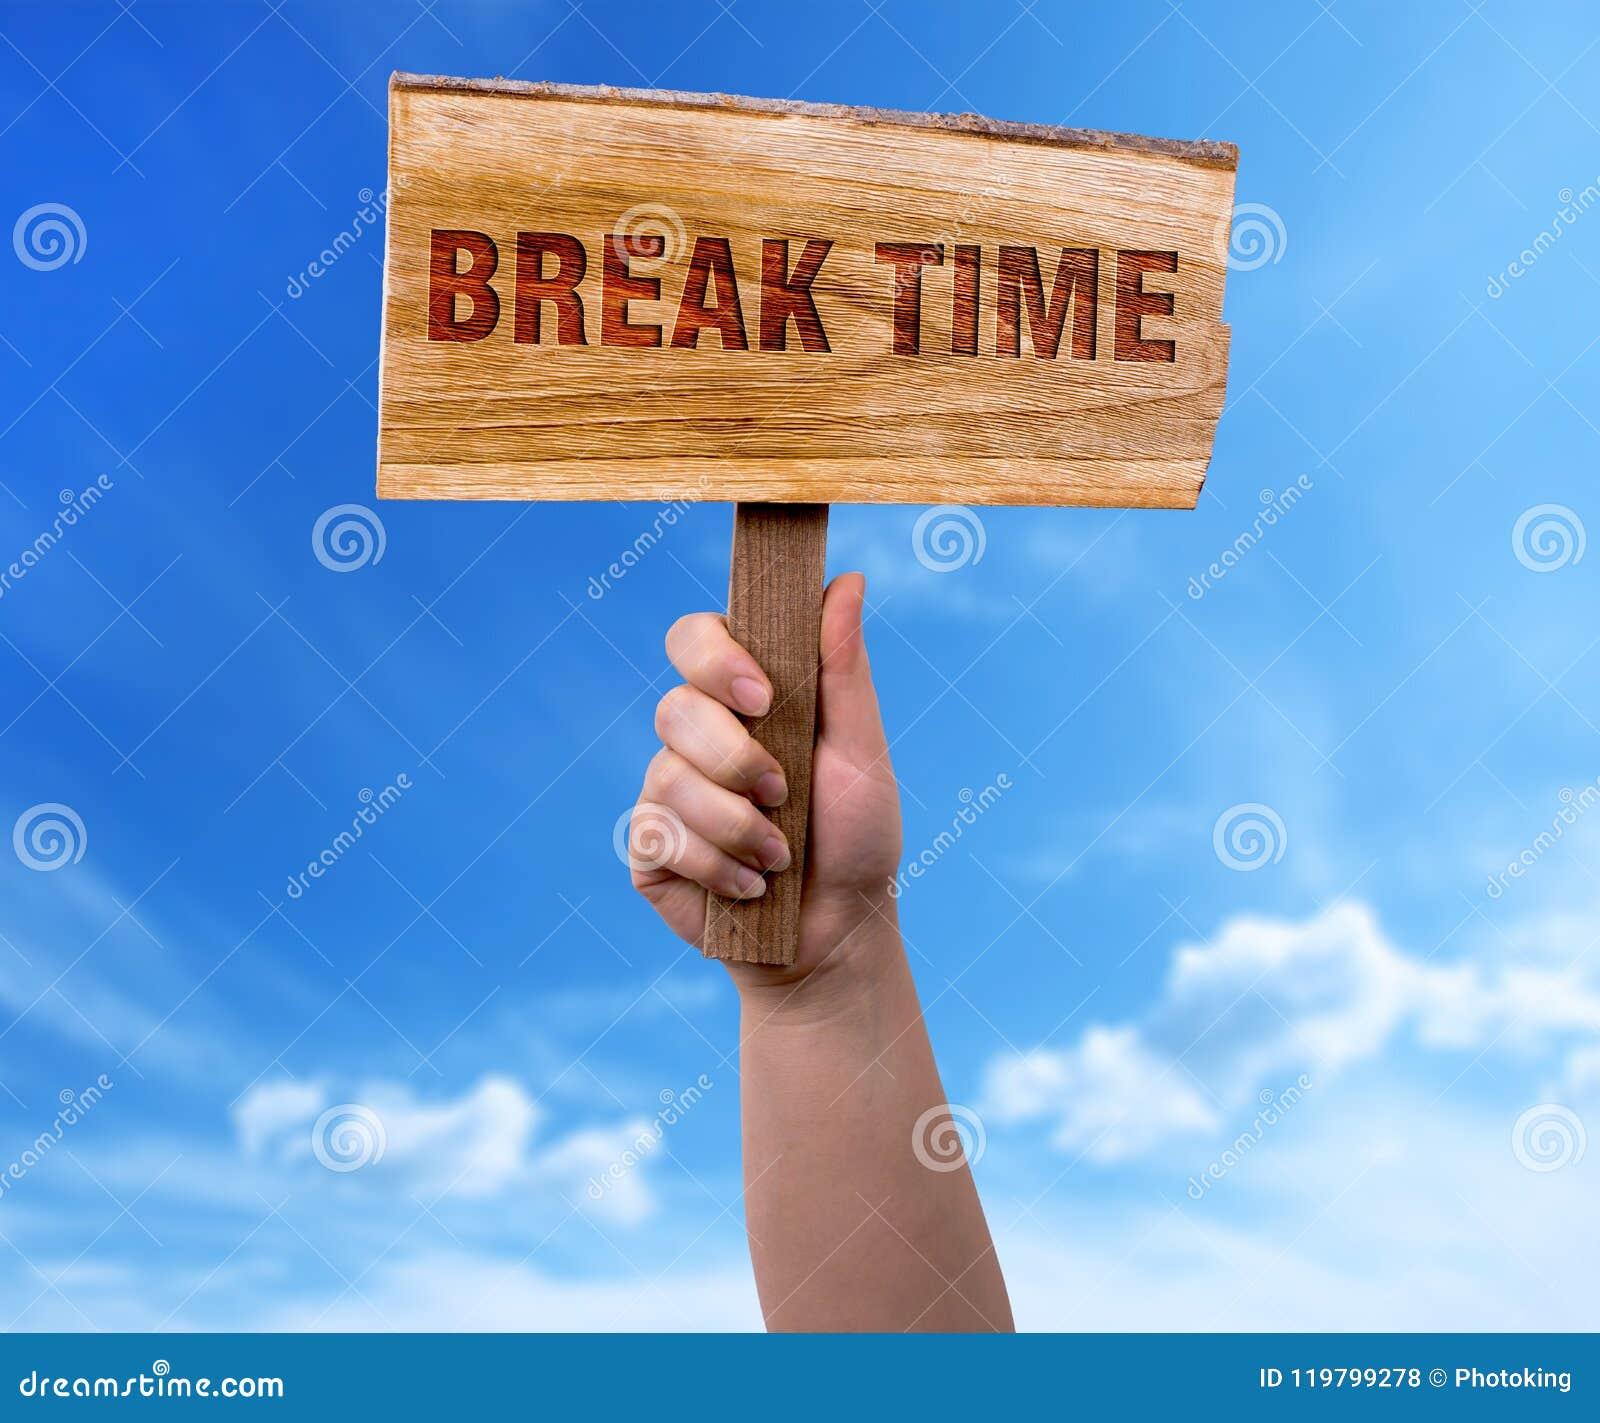 Break time wooden sign